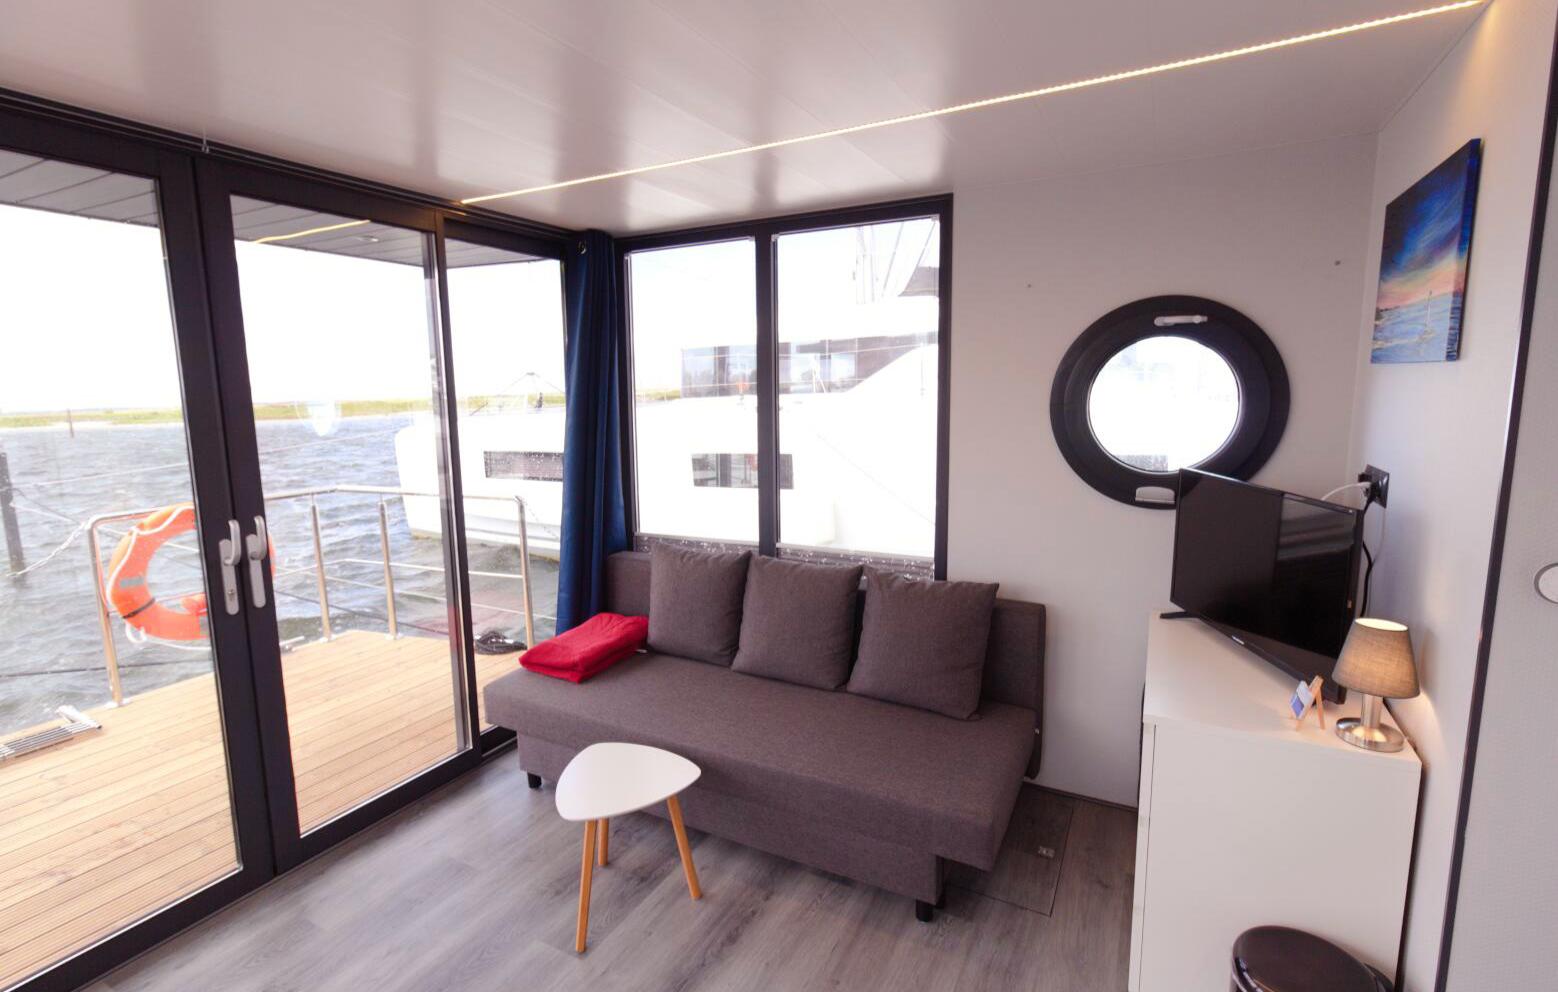 hausboot-uebernachtung-o-sauna-3-tage-2-uen-2-personen-bg4